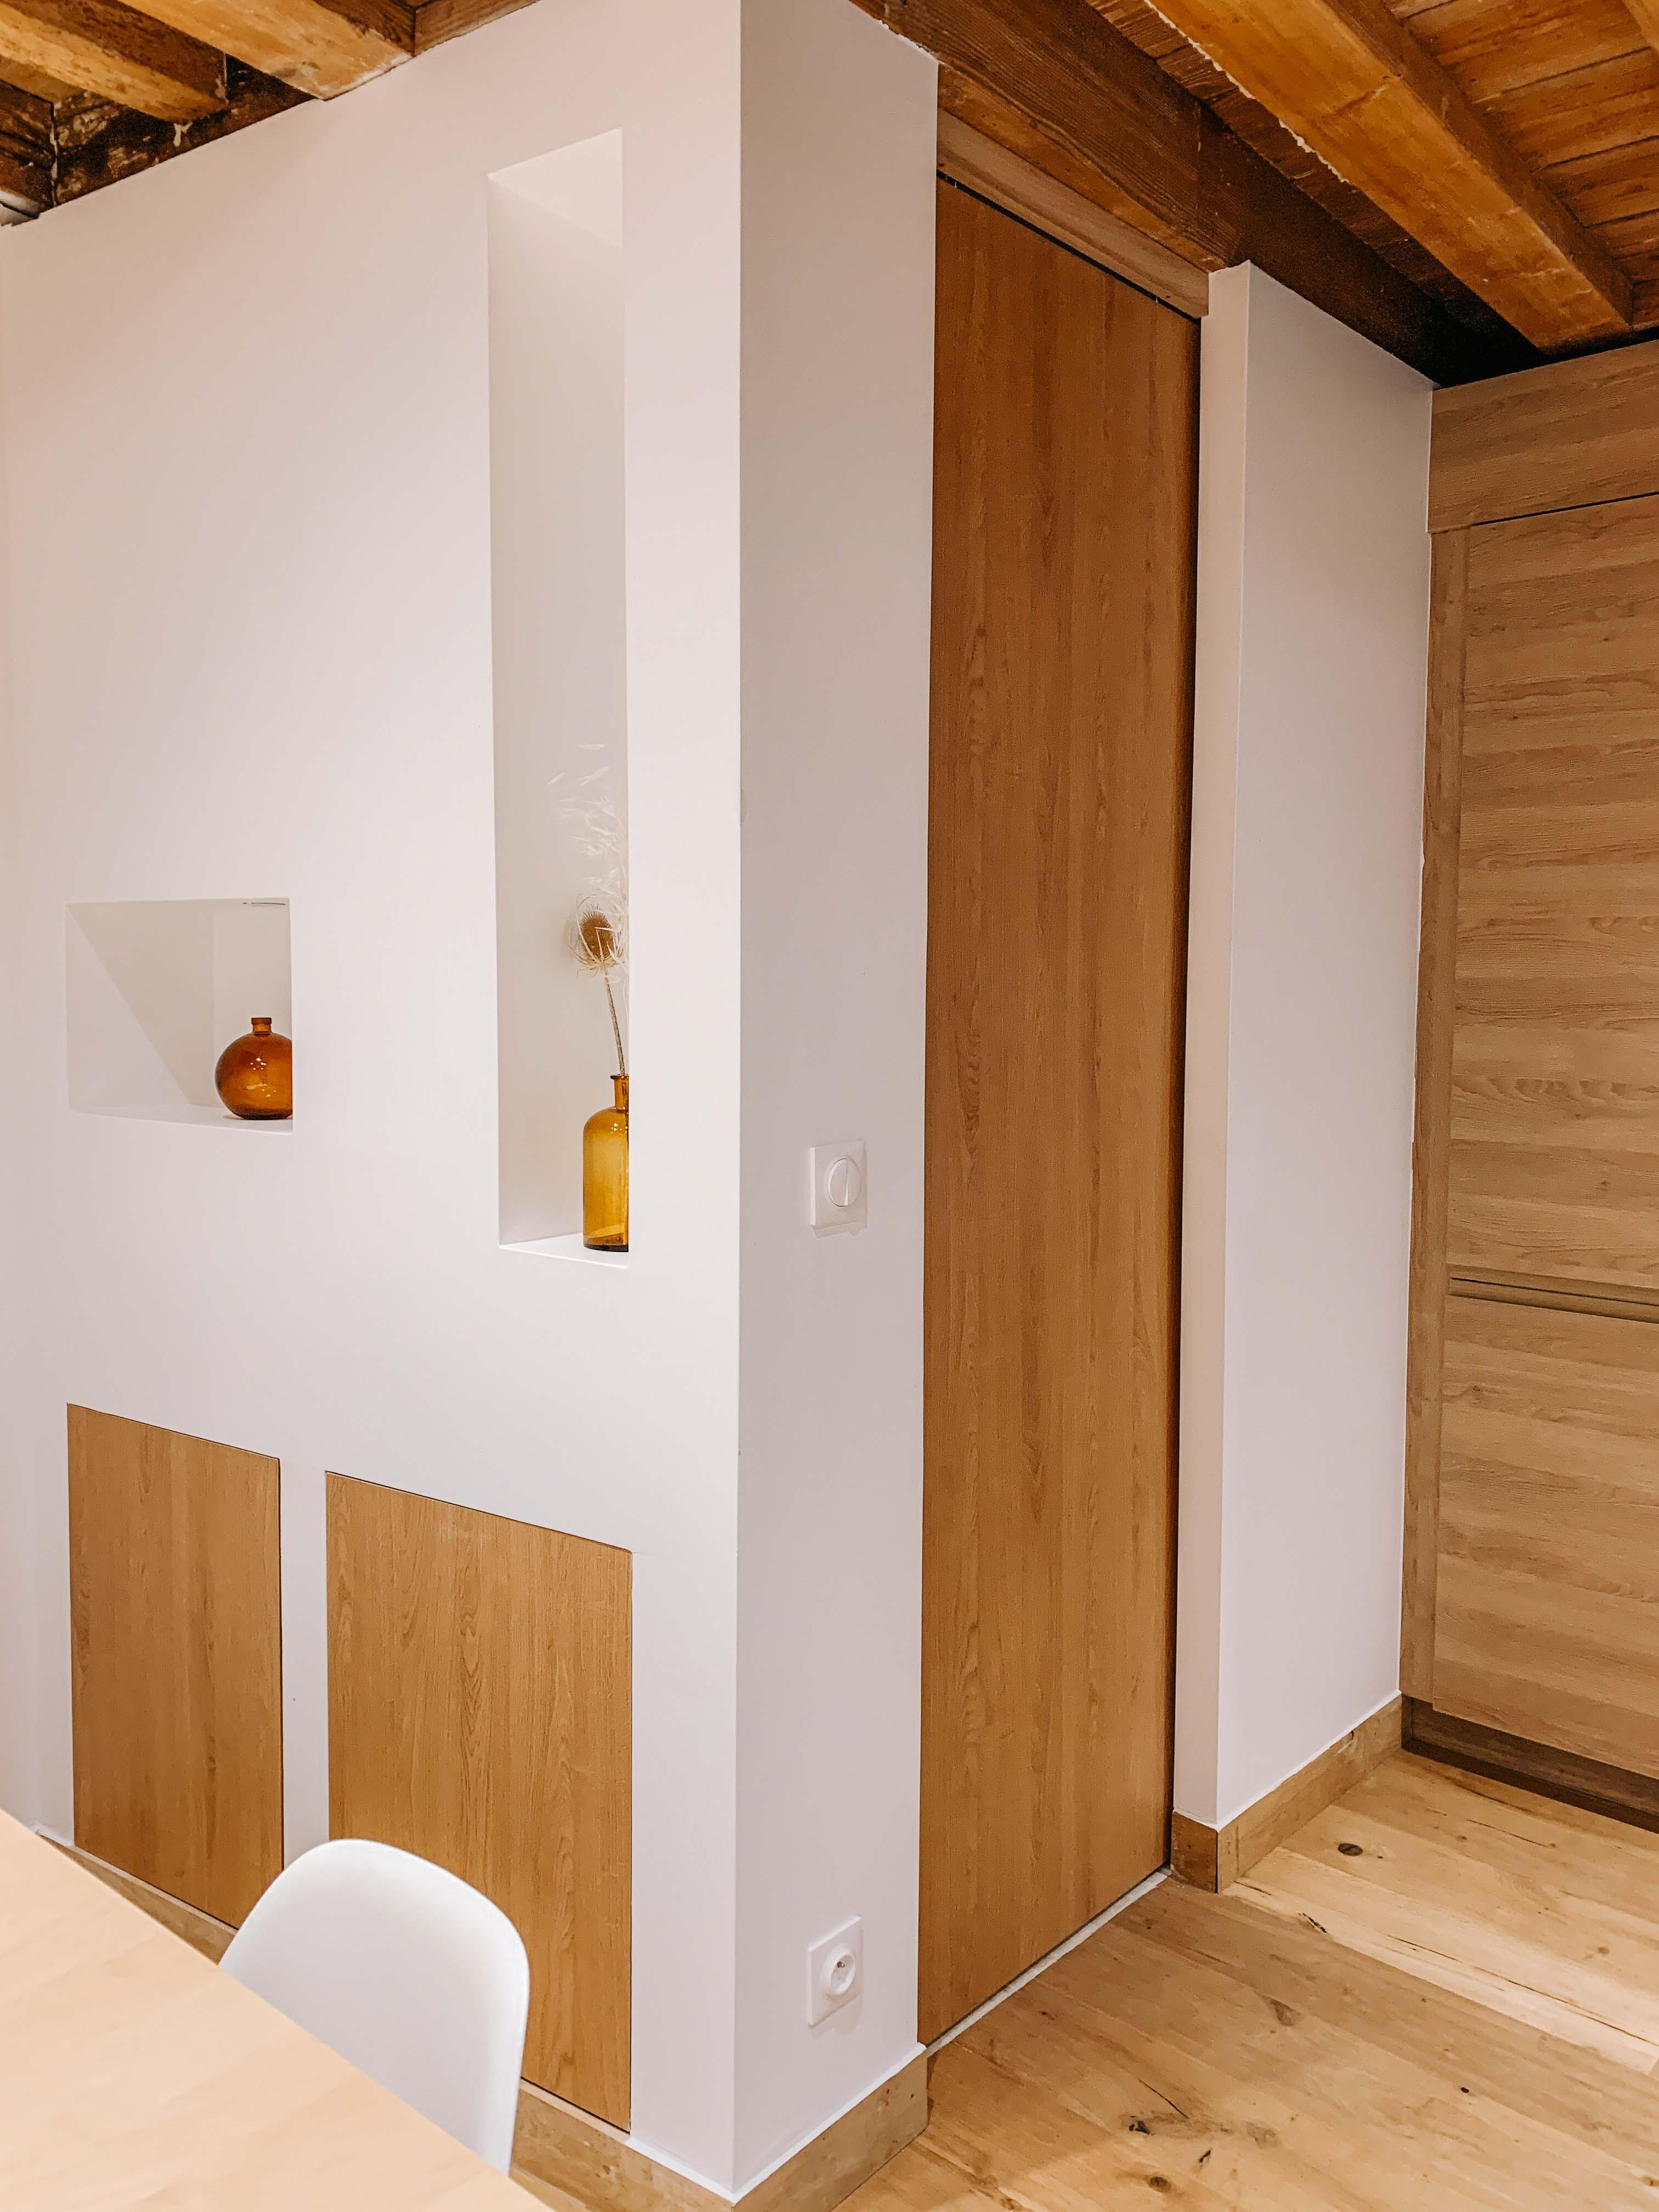 architecte-lyon-rénovation-presbytere-marcilly-azergues-pierre-dorée-19